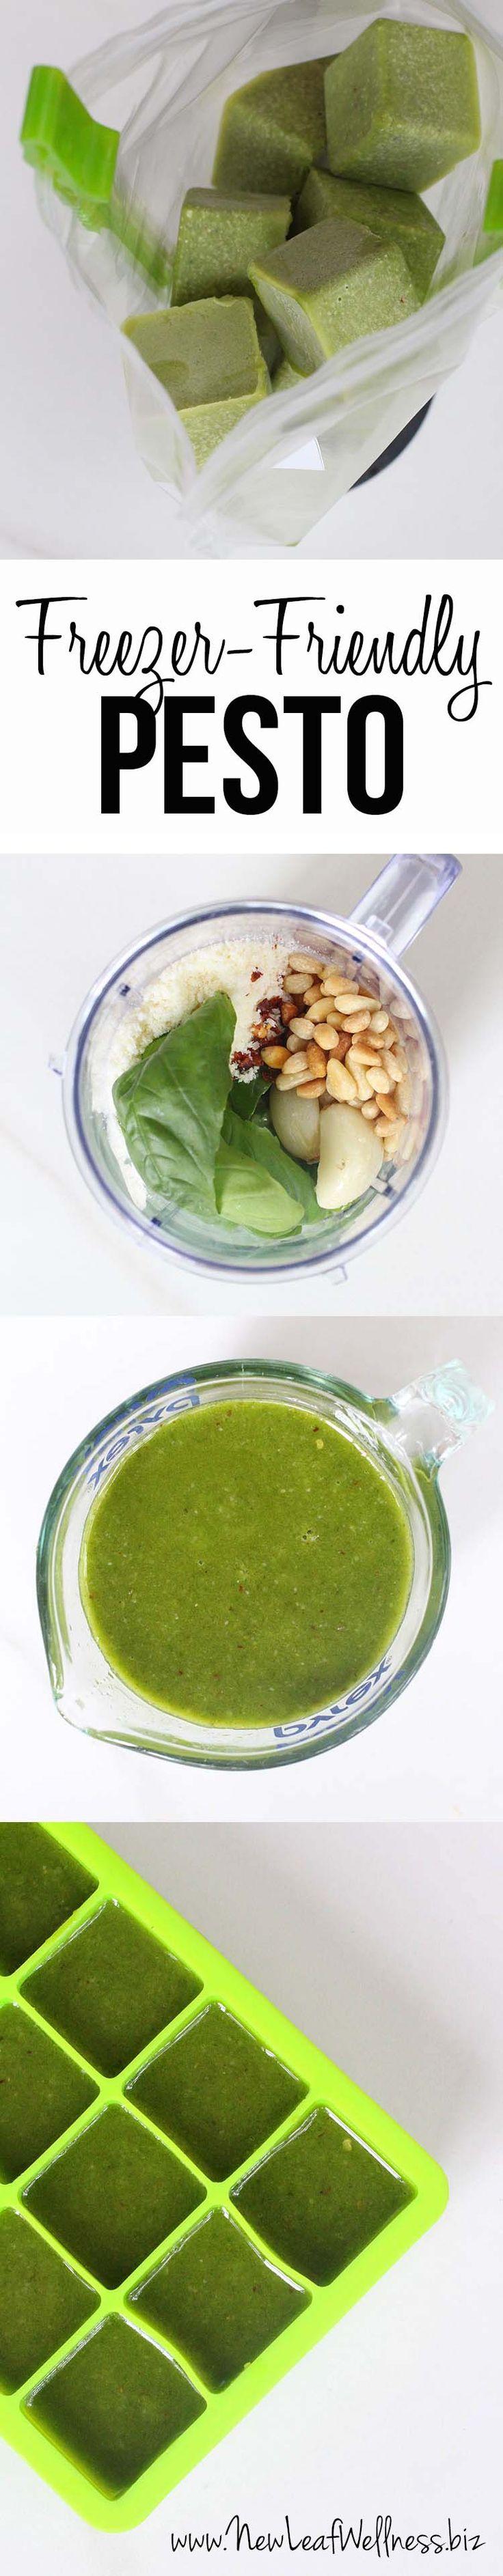 Make and freeze pesto recipe